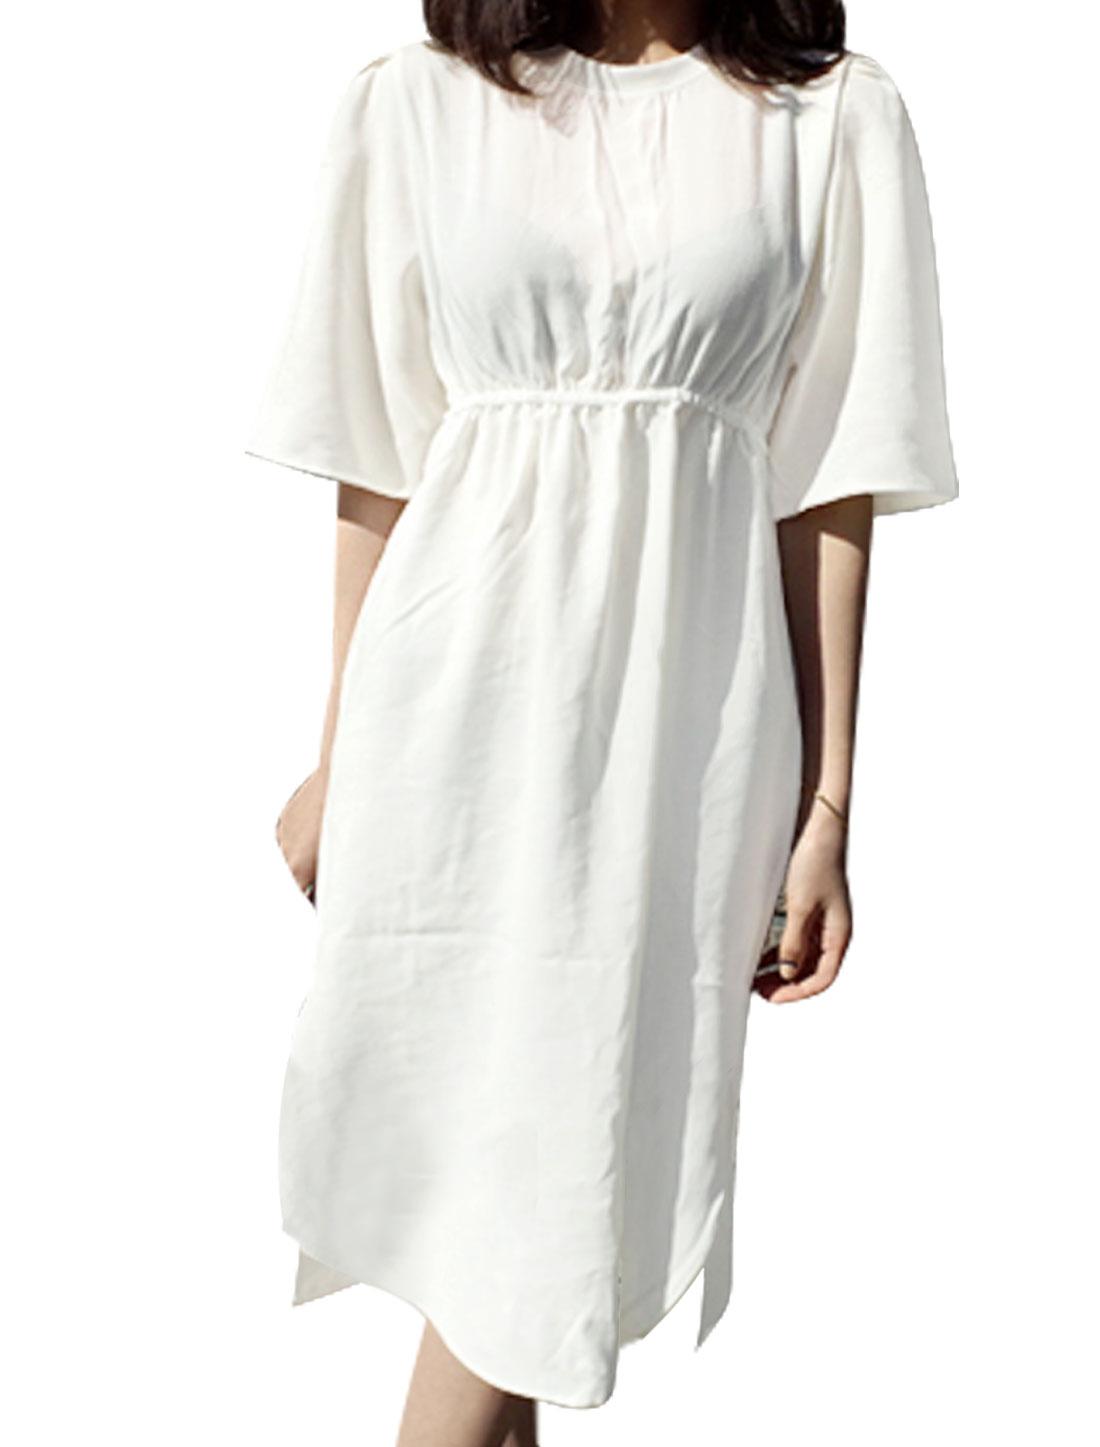 Women Elbow Sleeve Round Neck Elastic Waist High-Low Hem Casual Dress White XS